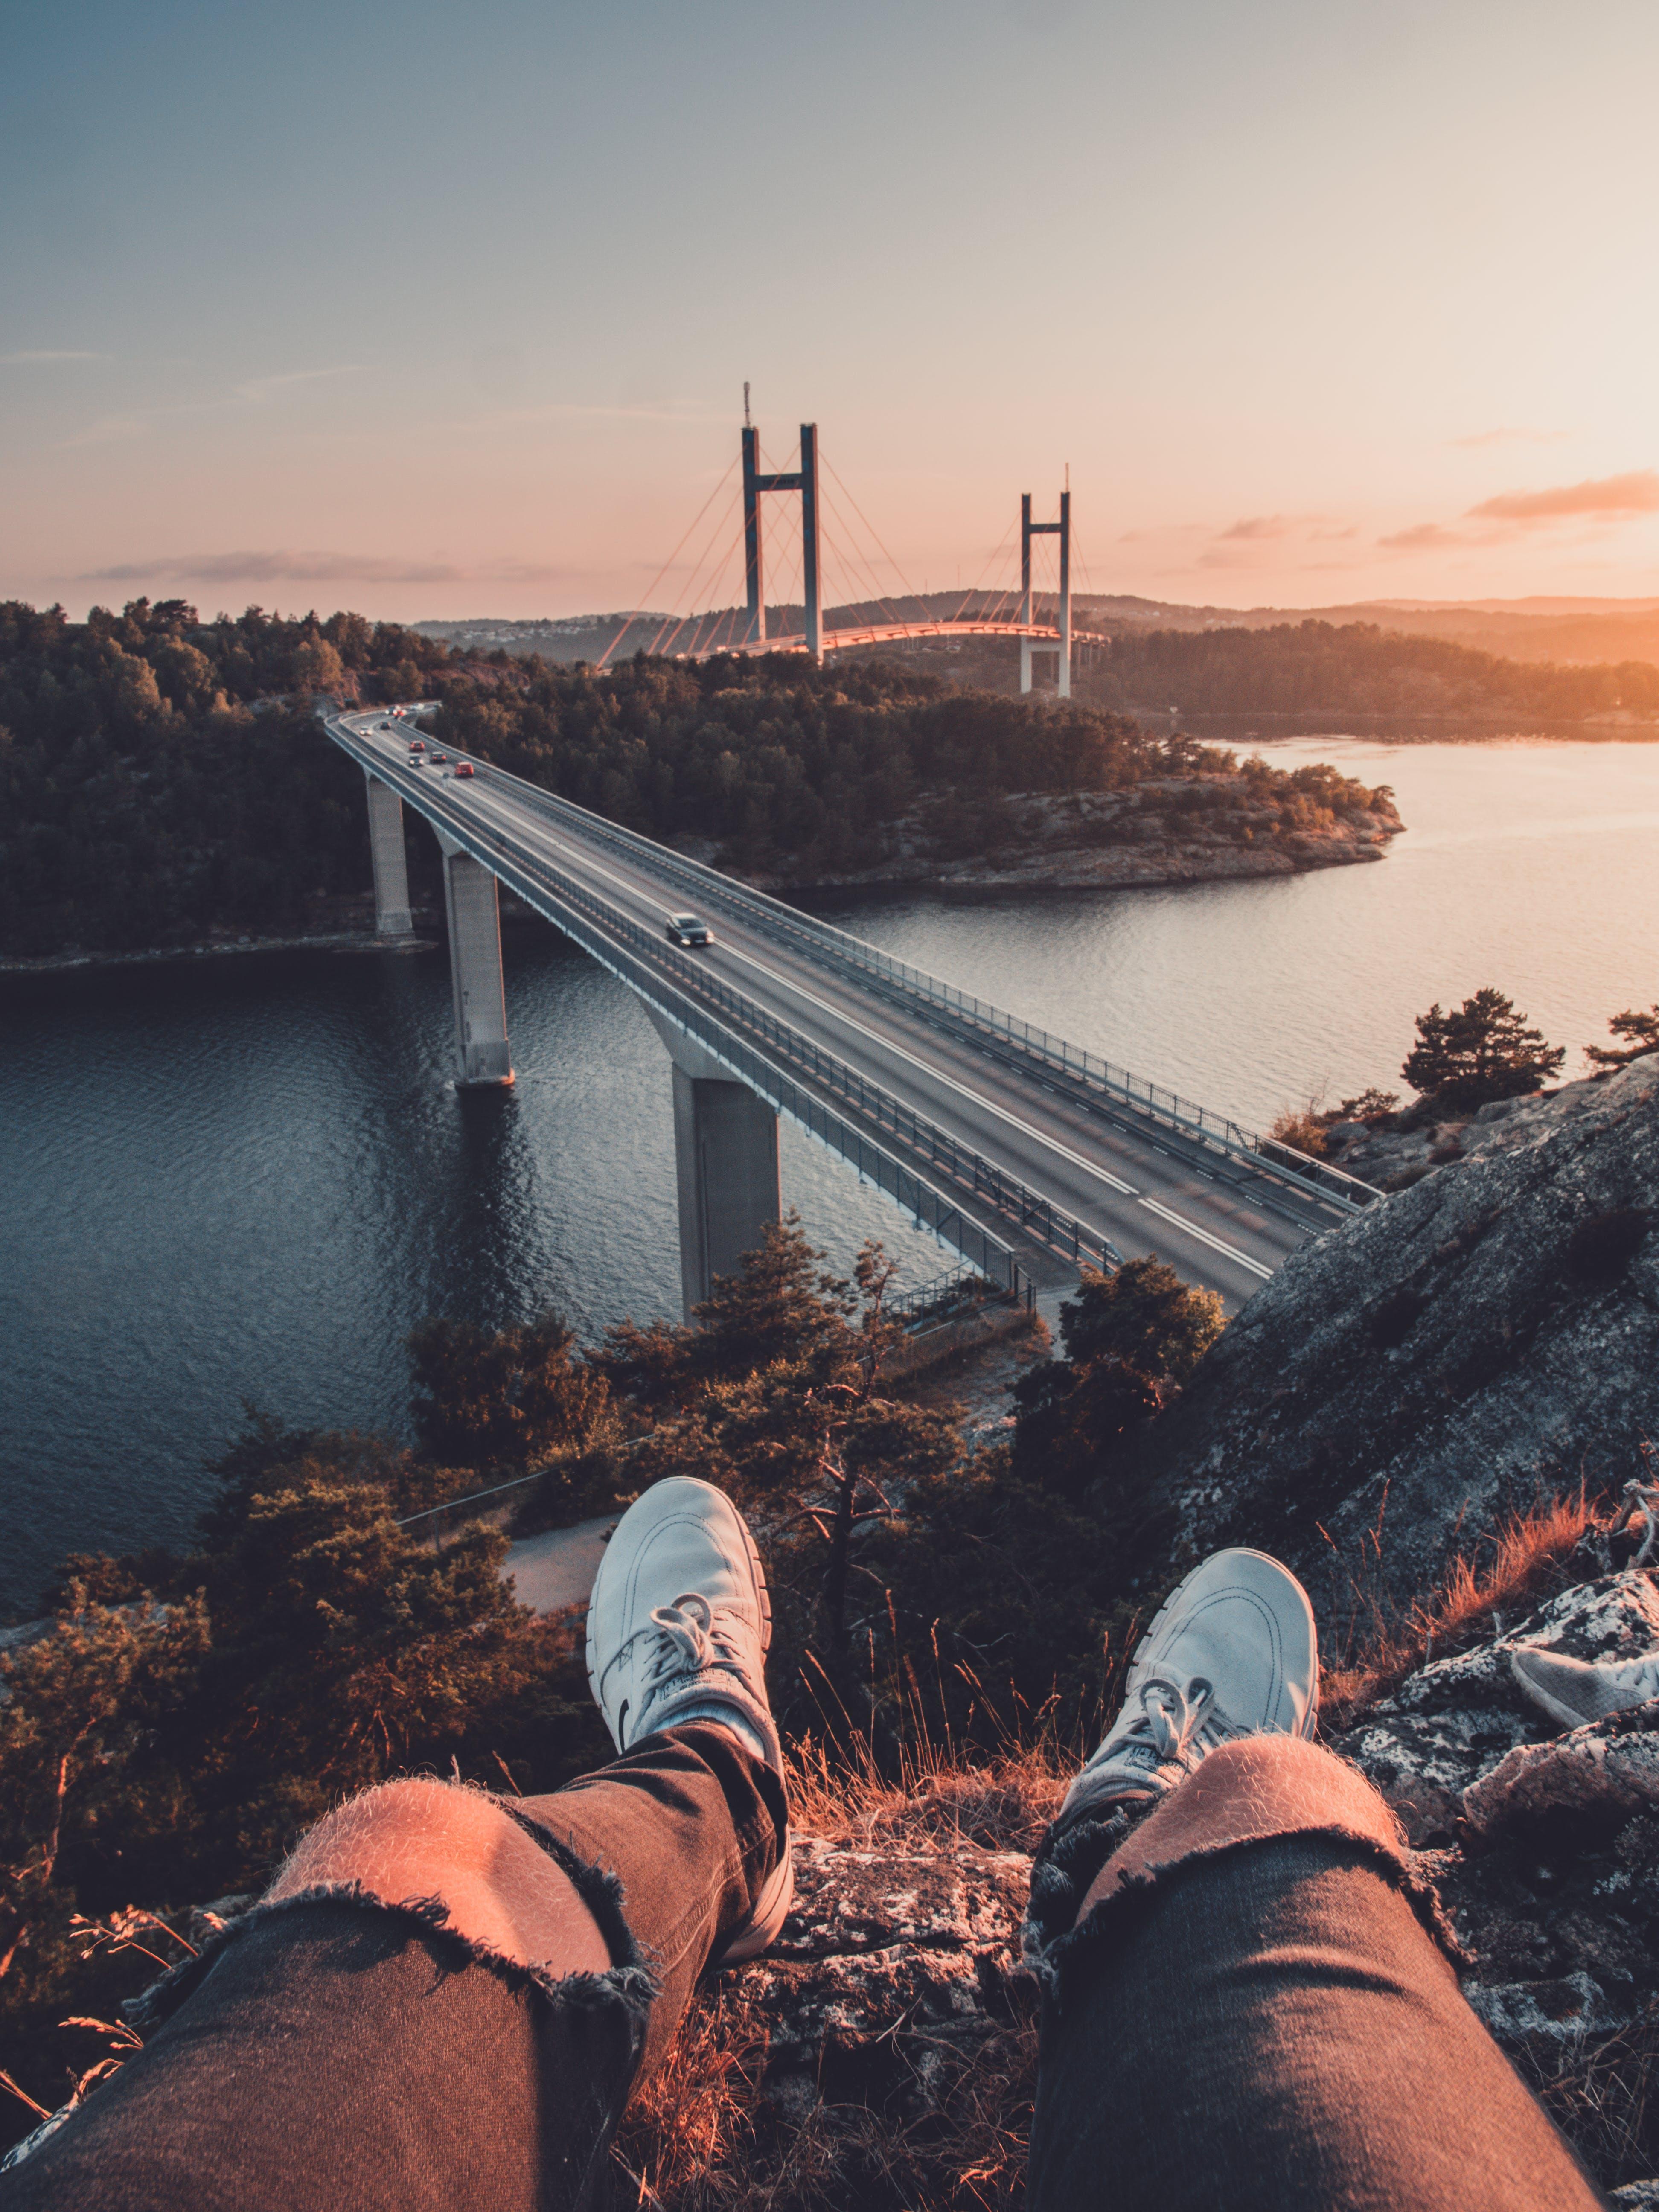 Man Sitting on Rock Near Bridge